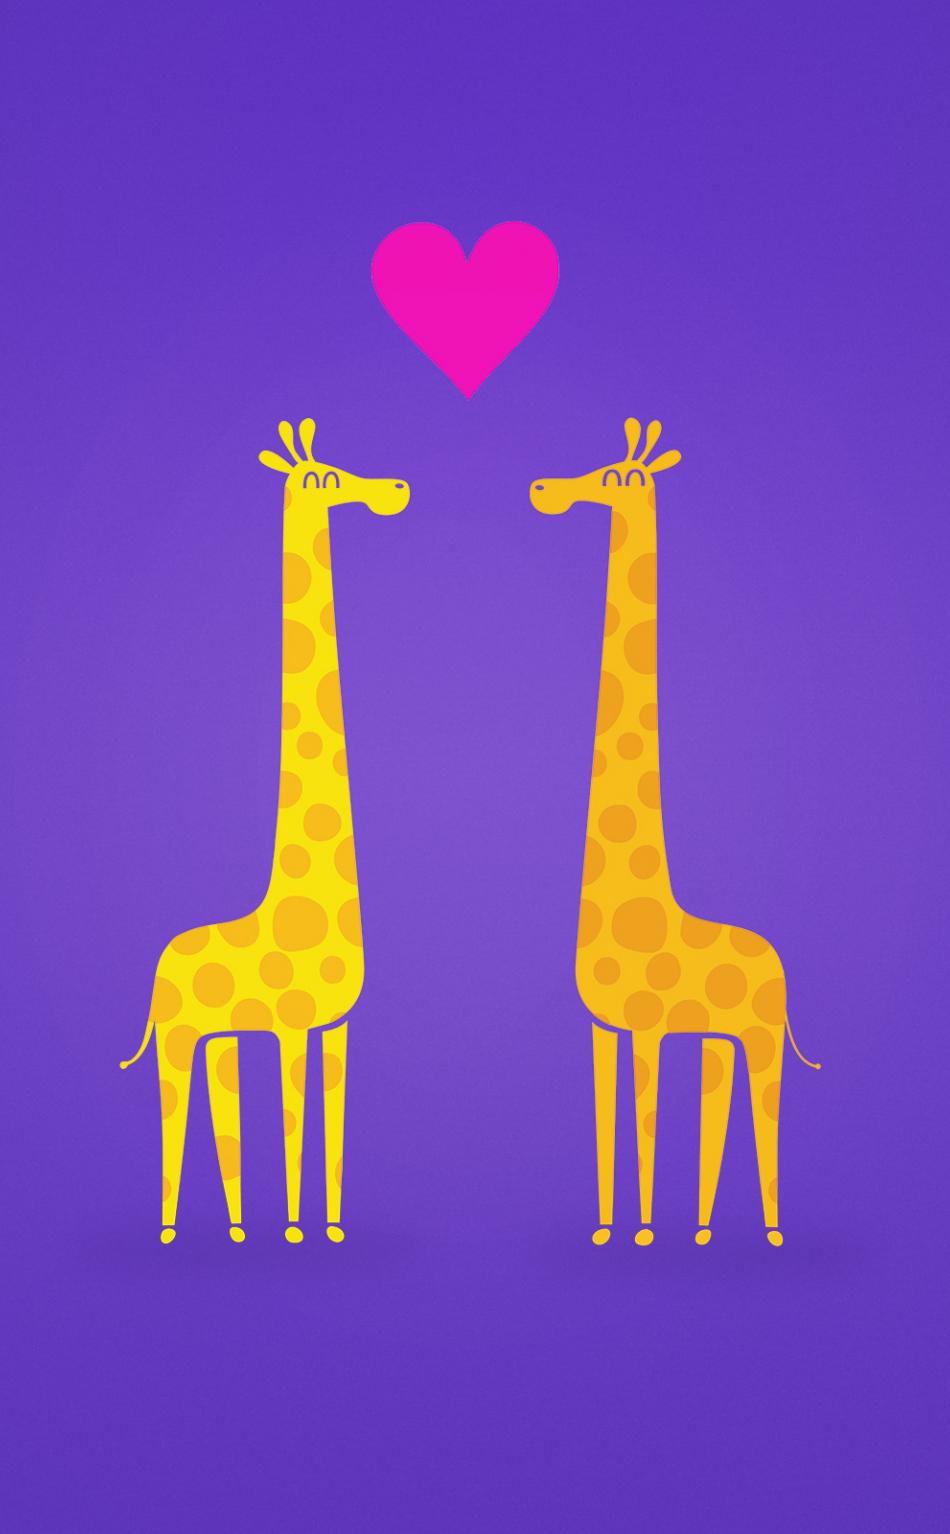 Download 950x1534 Wallpaper Giraffe Couple Love Minimal Cartoon Iphone 950x1534 Hd Image Background 231